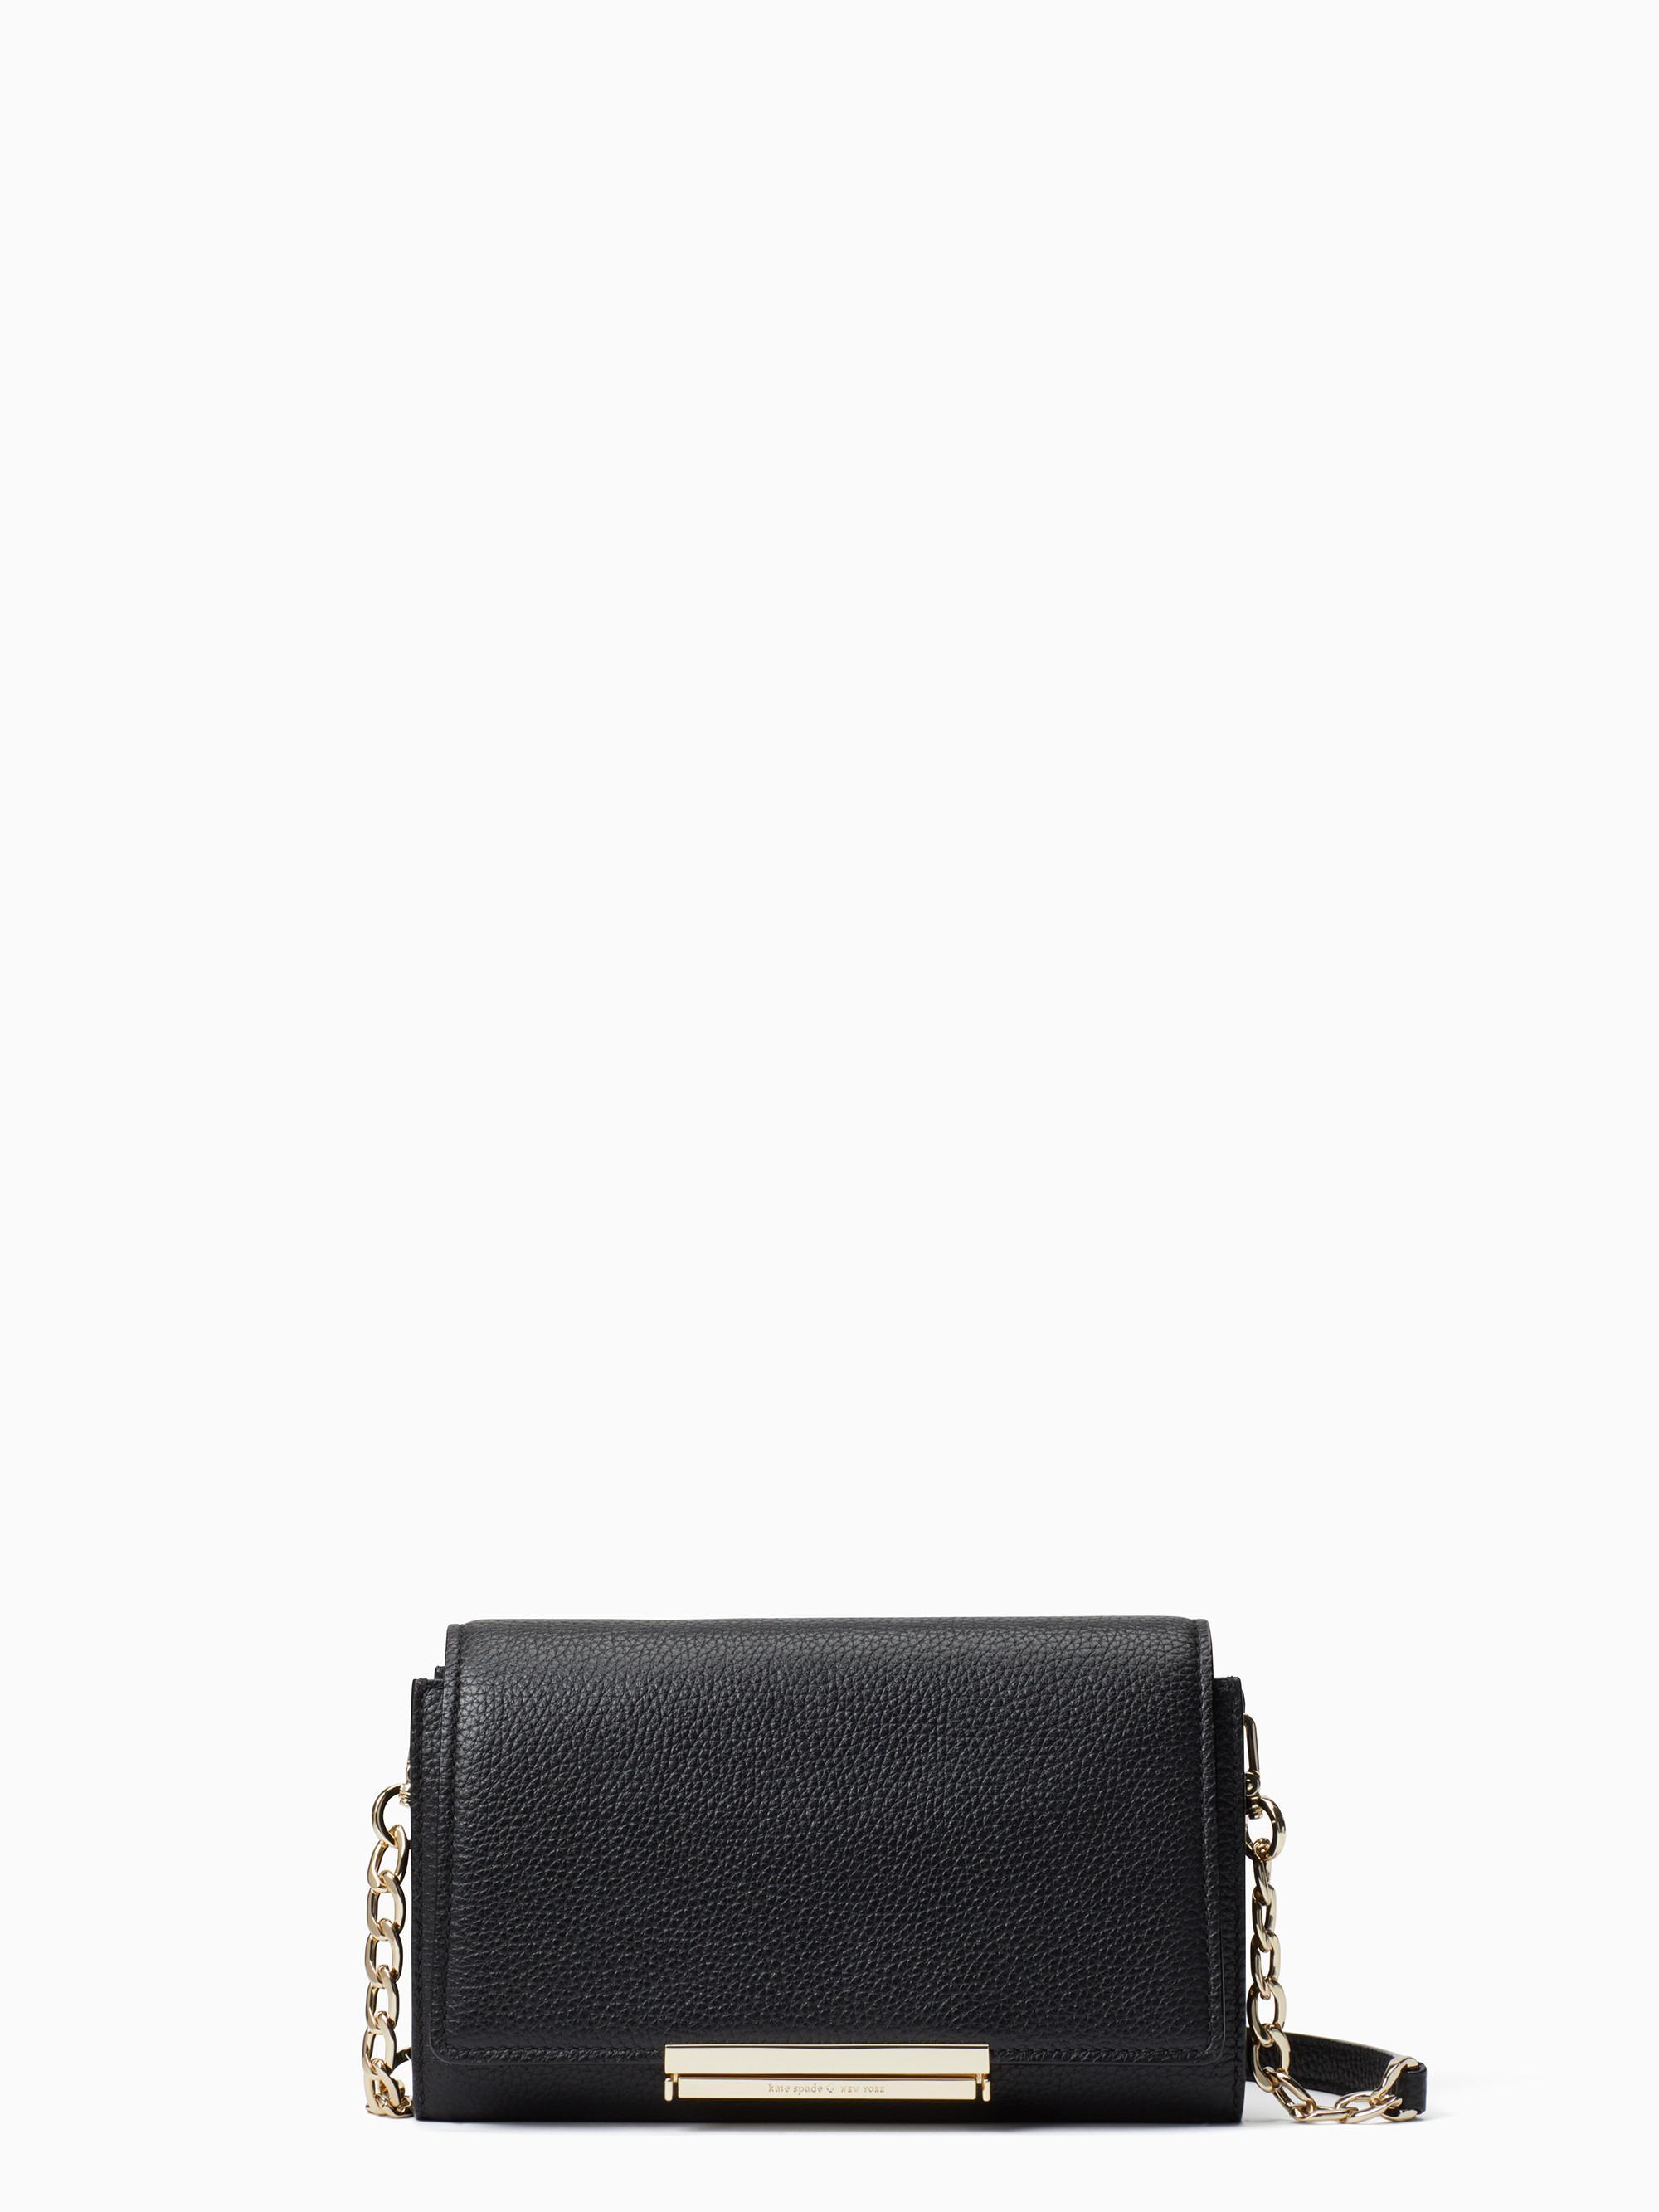 Kate Spade Make It Mine Soft-Leather Camila In Black